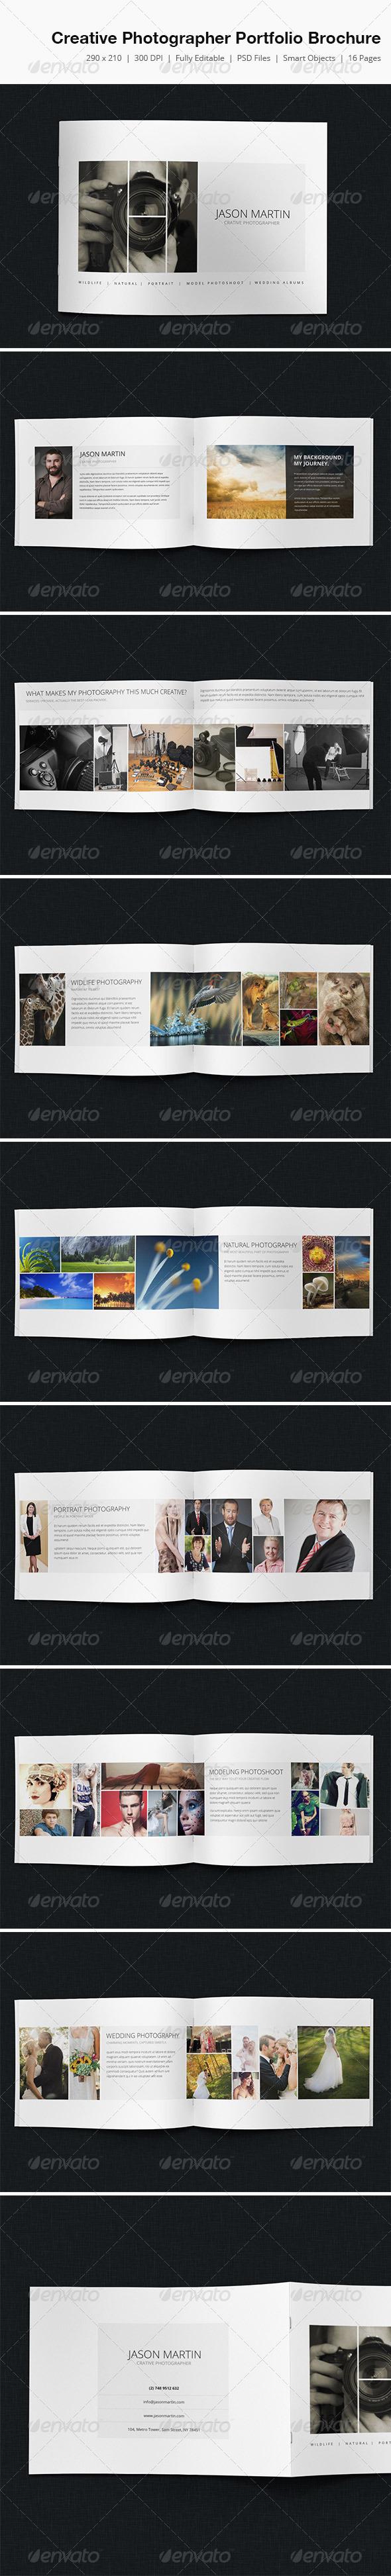 GraphicRiver Creative Photographer Portfolio Brochure 5092284